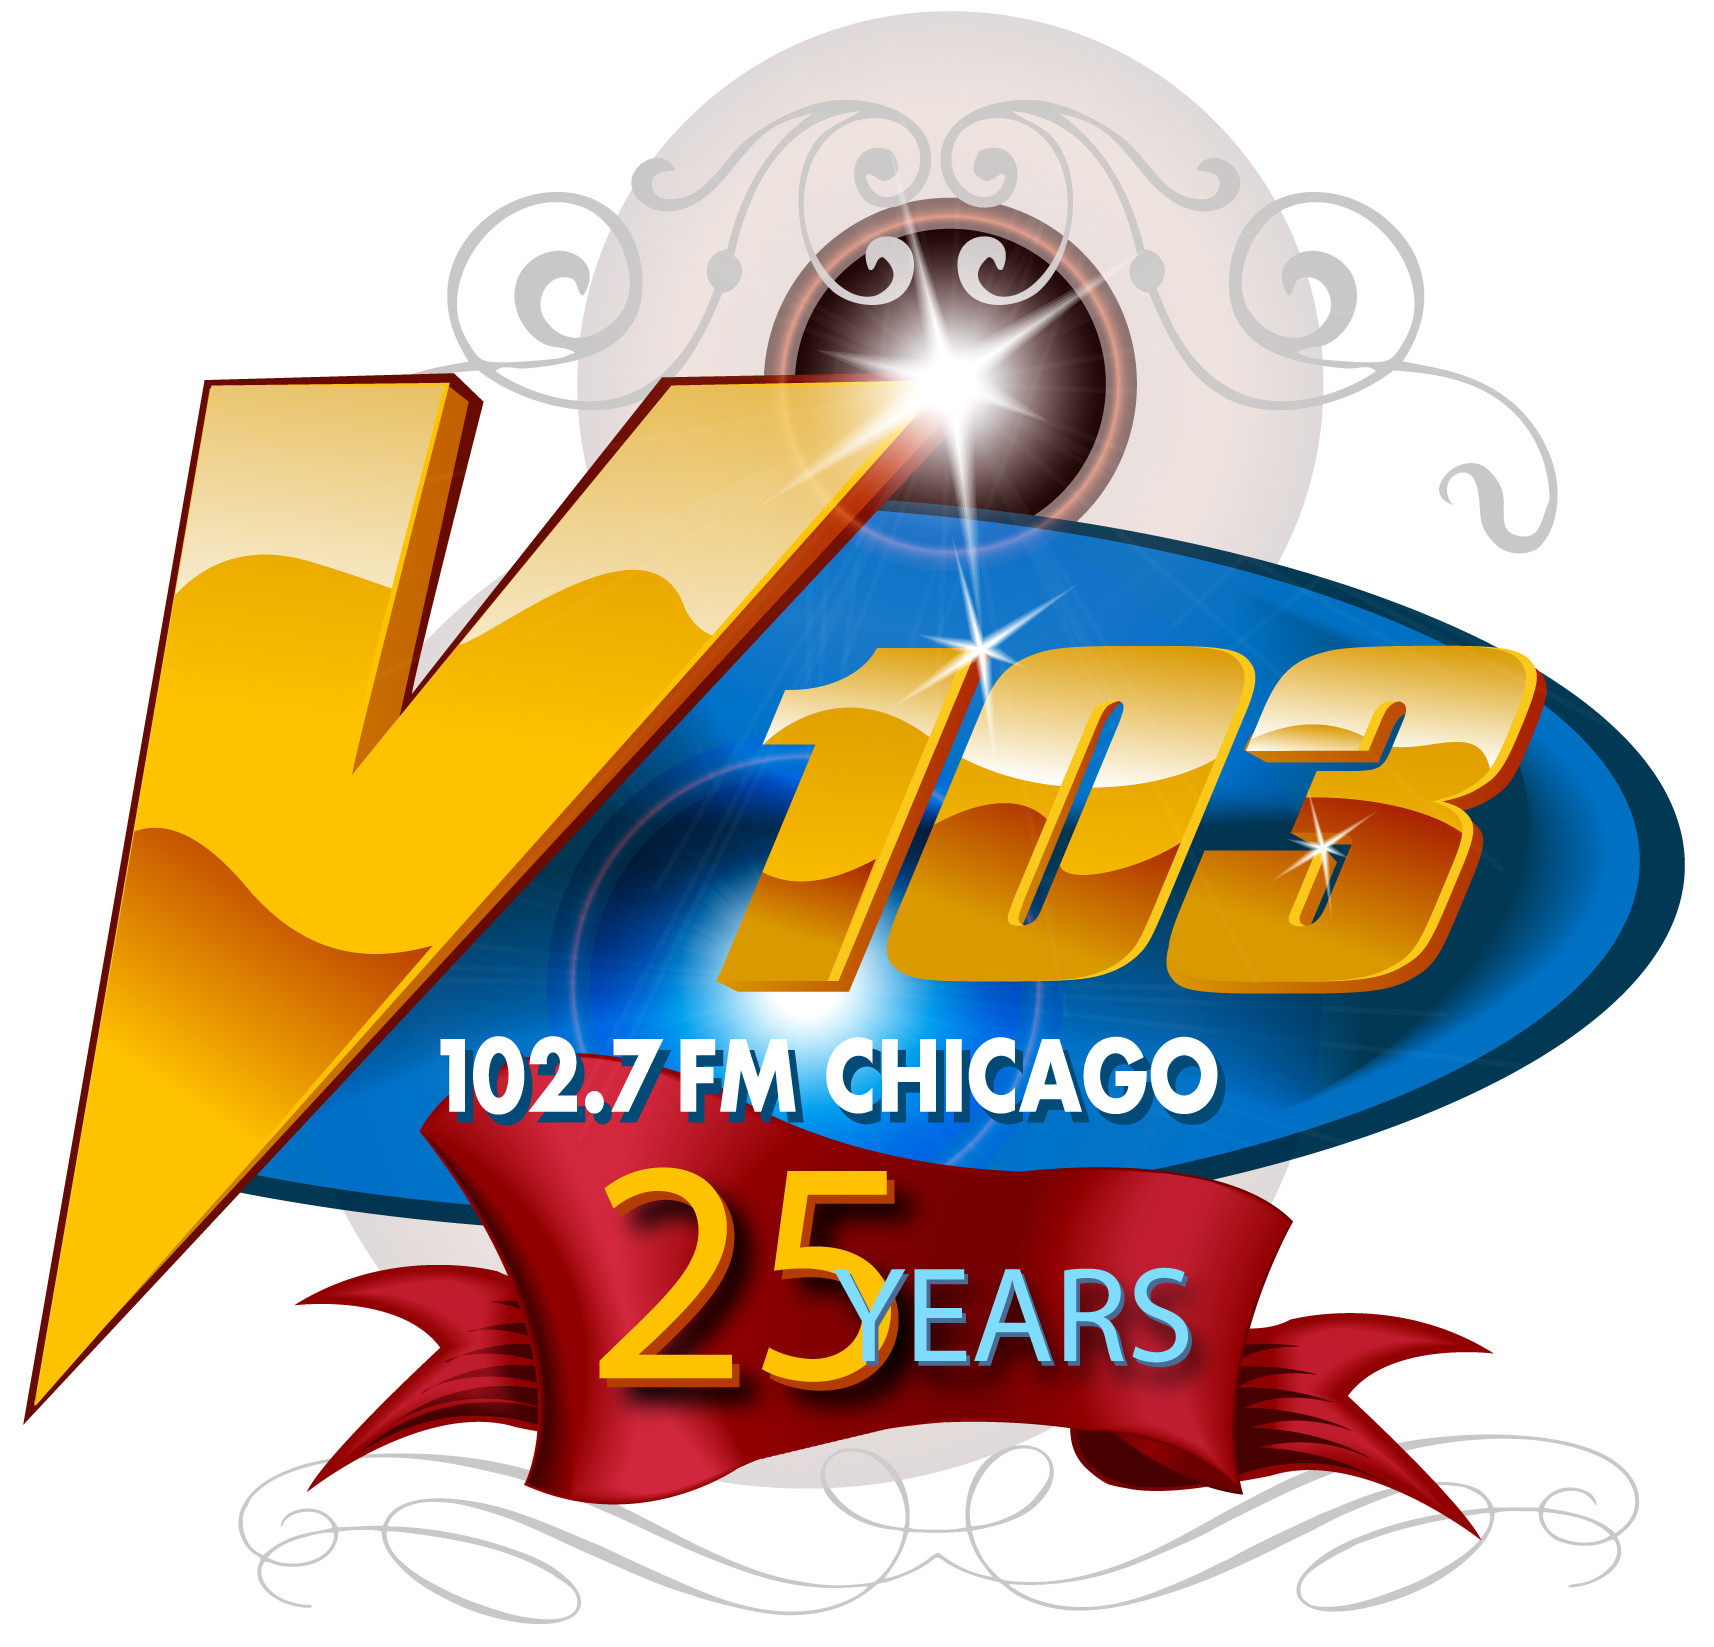 V103 25th Anniversary logo